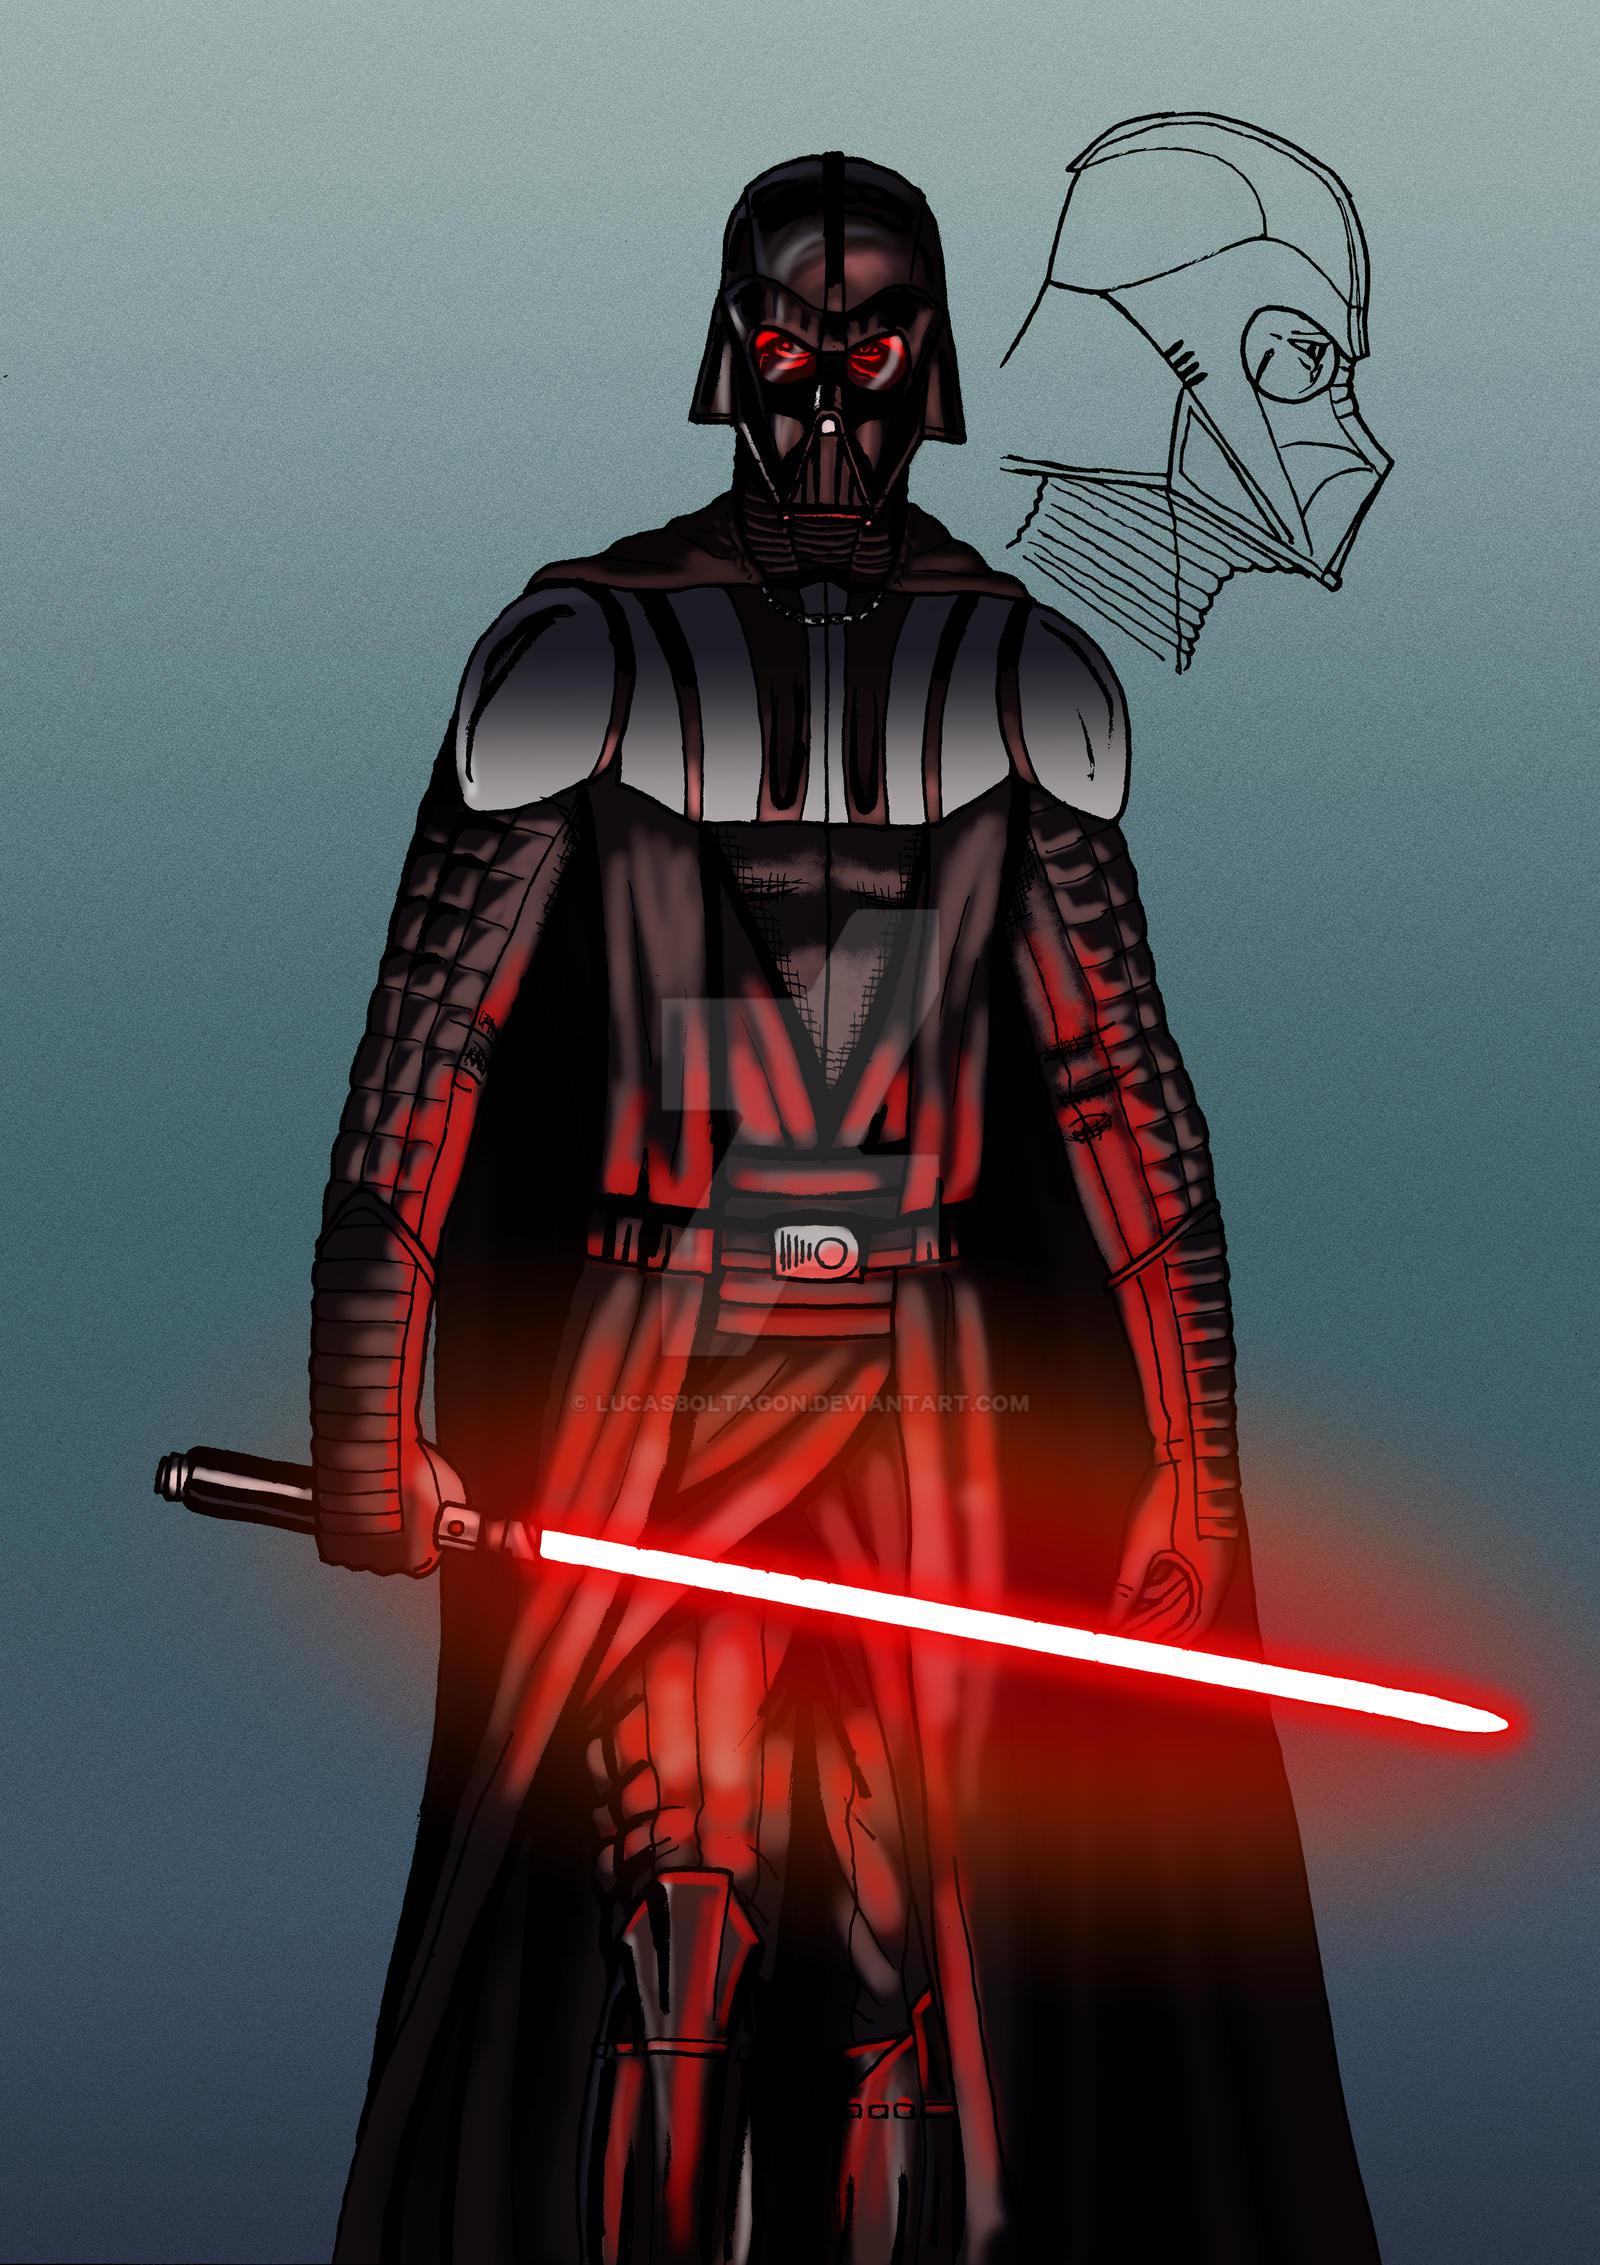 Darth Vader Modern Design 27 12 2015 By Lucasboltagon On